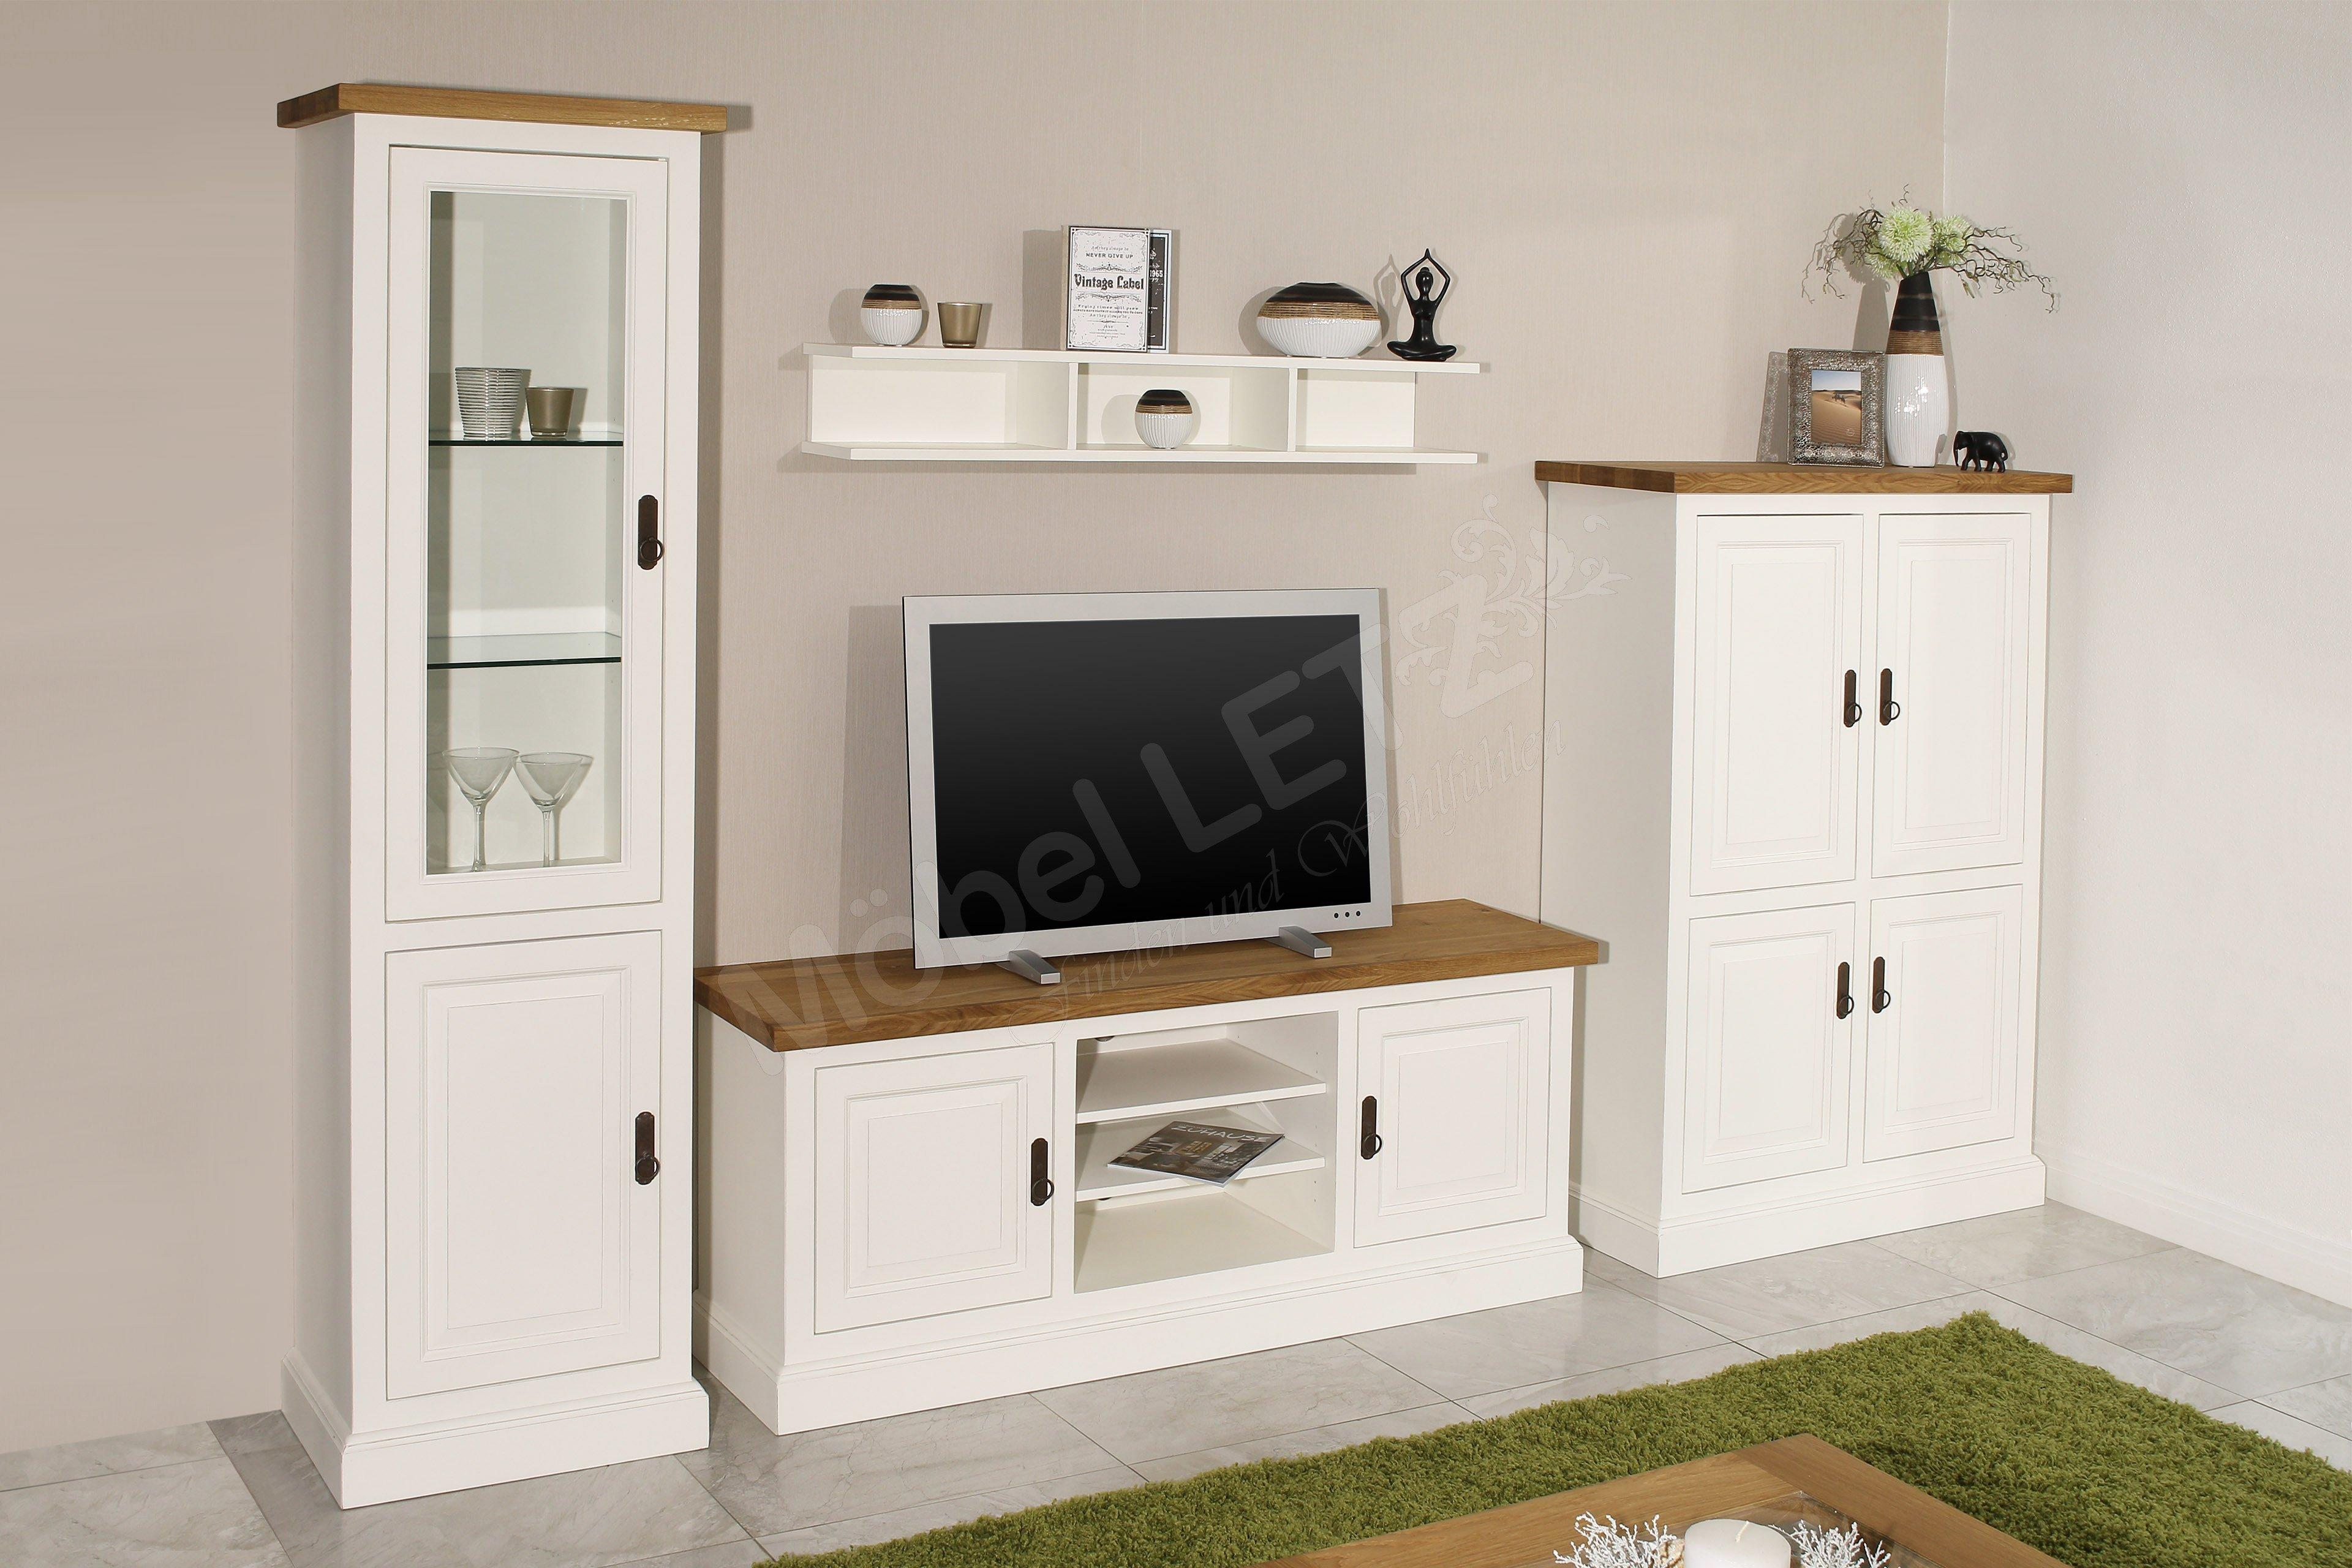 ludwik styl wohnwand toulon massivholz wei m bel letz. Black Bedroom Furniture Sets. Home Design Ideas